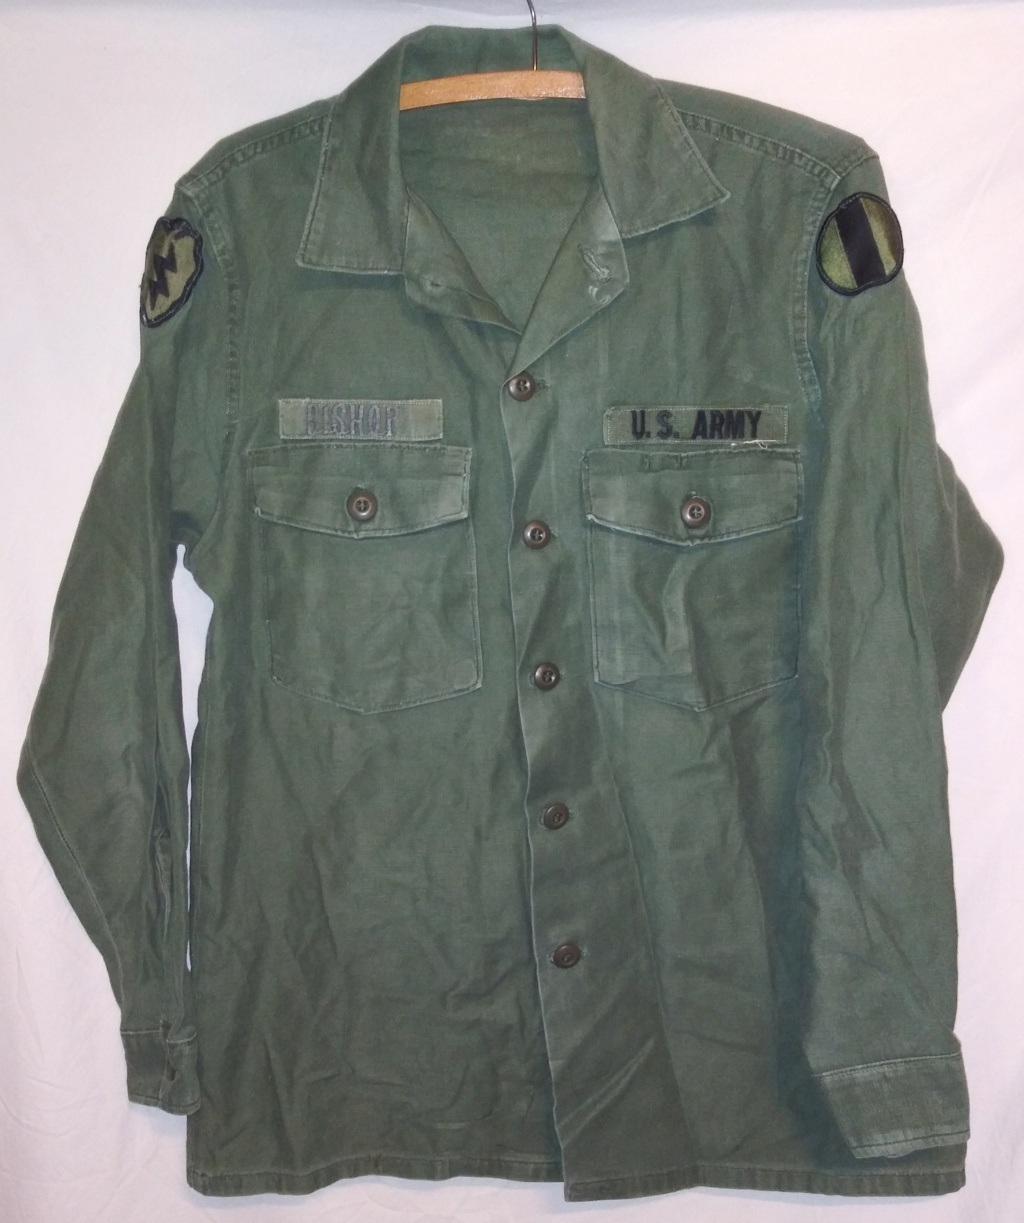 A few Vietnam War era Army Shirts and Jackets 20191230